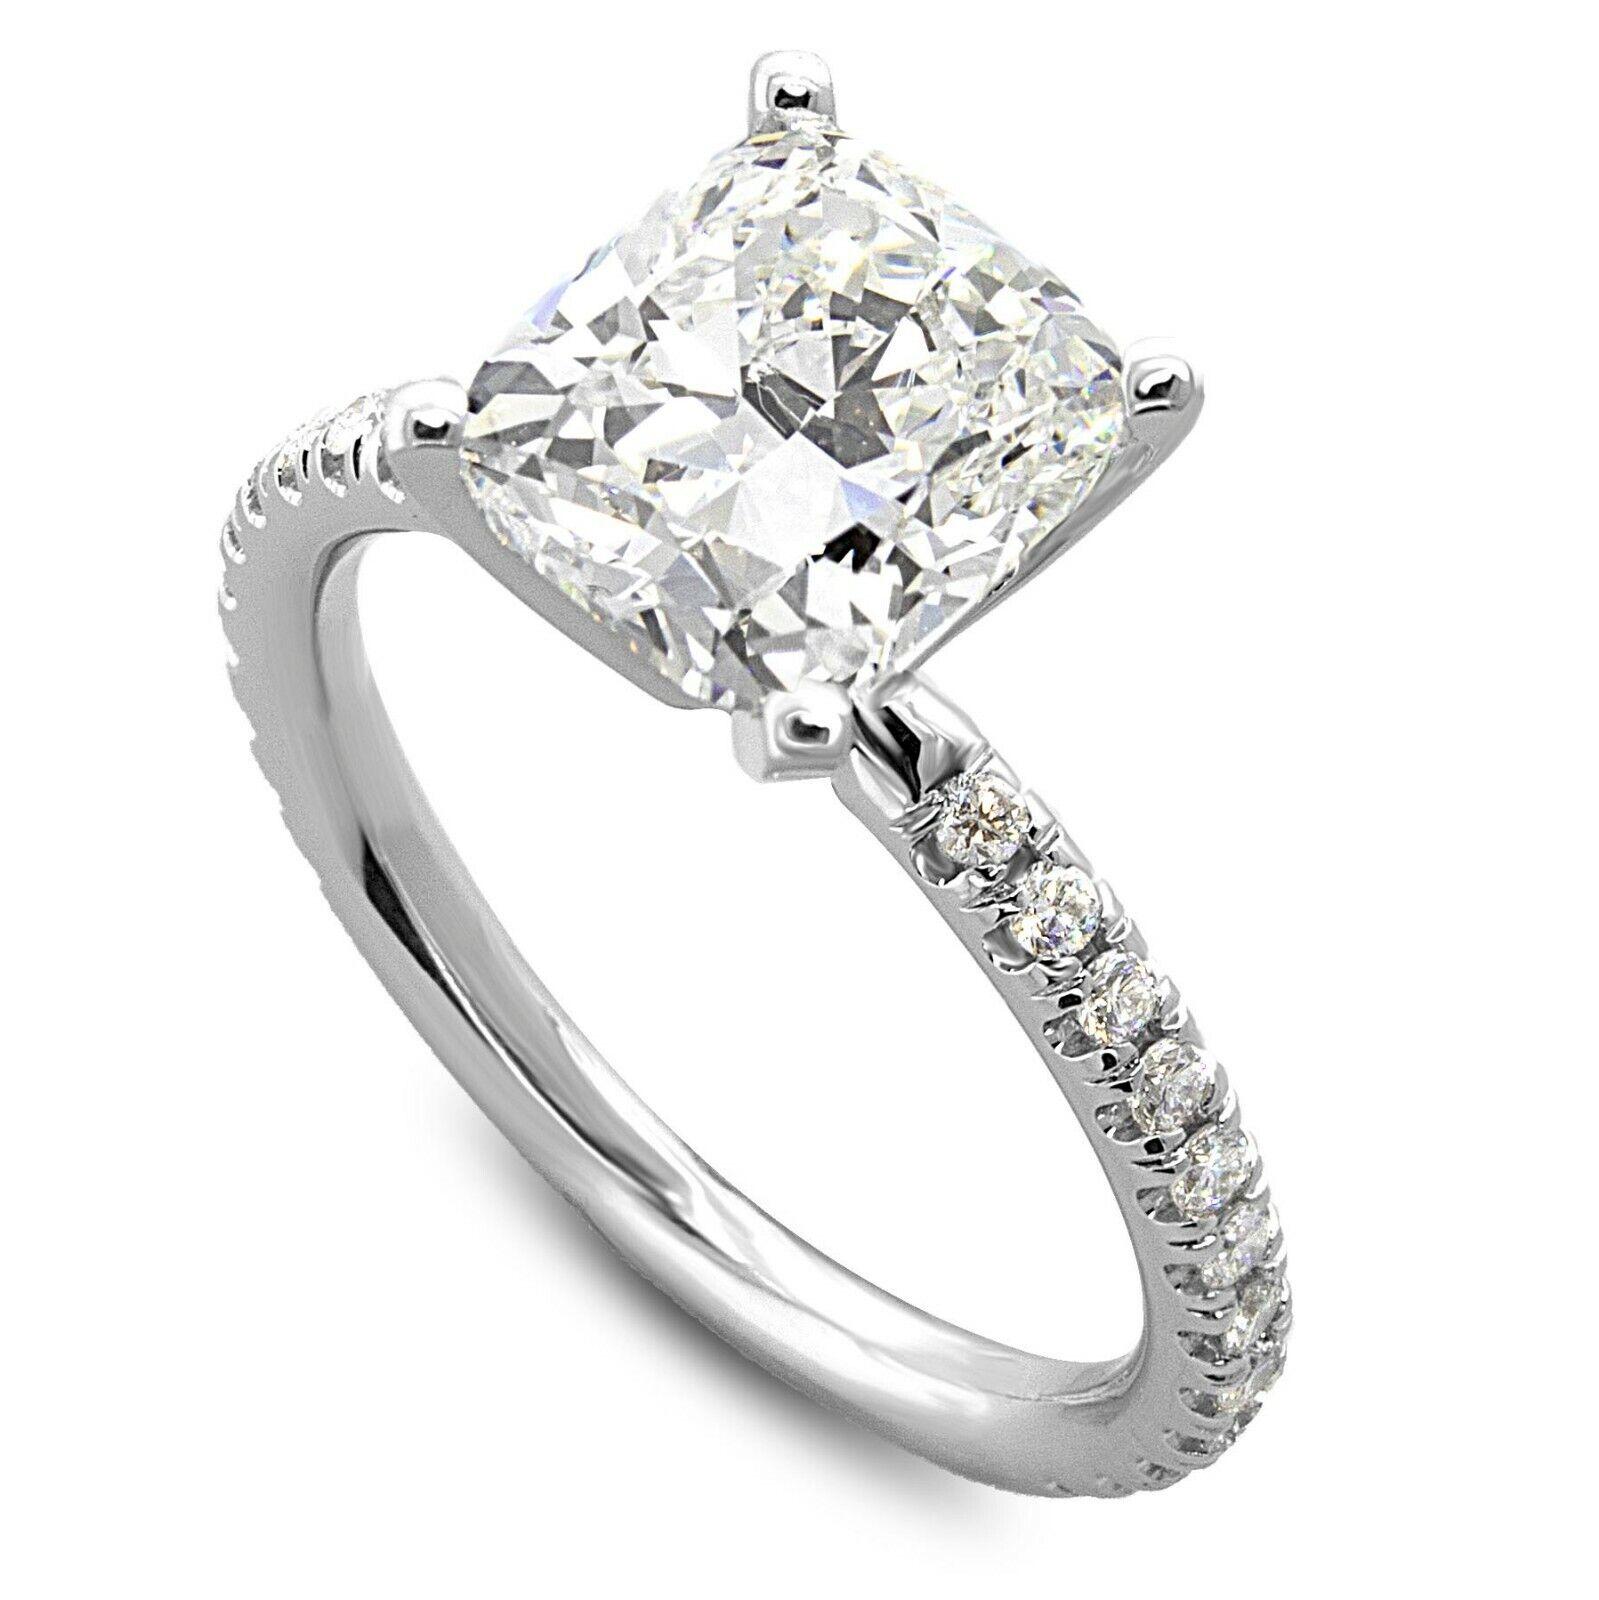 1.75 Carats G-SI1 GIA cert. Cushion Cut Diamond Engagement Ring - 14k White Gold